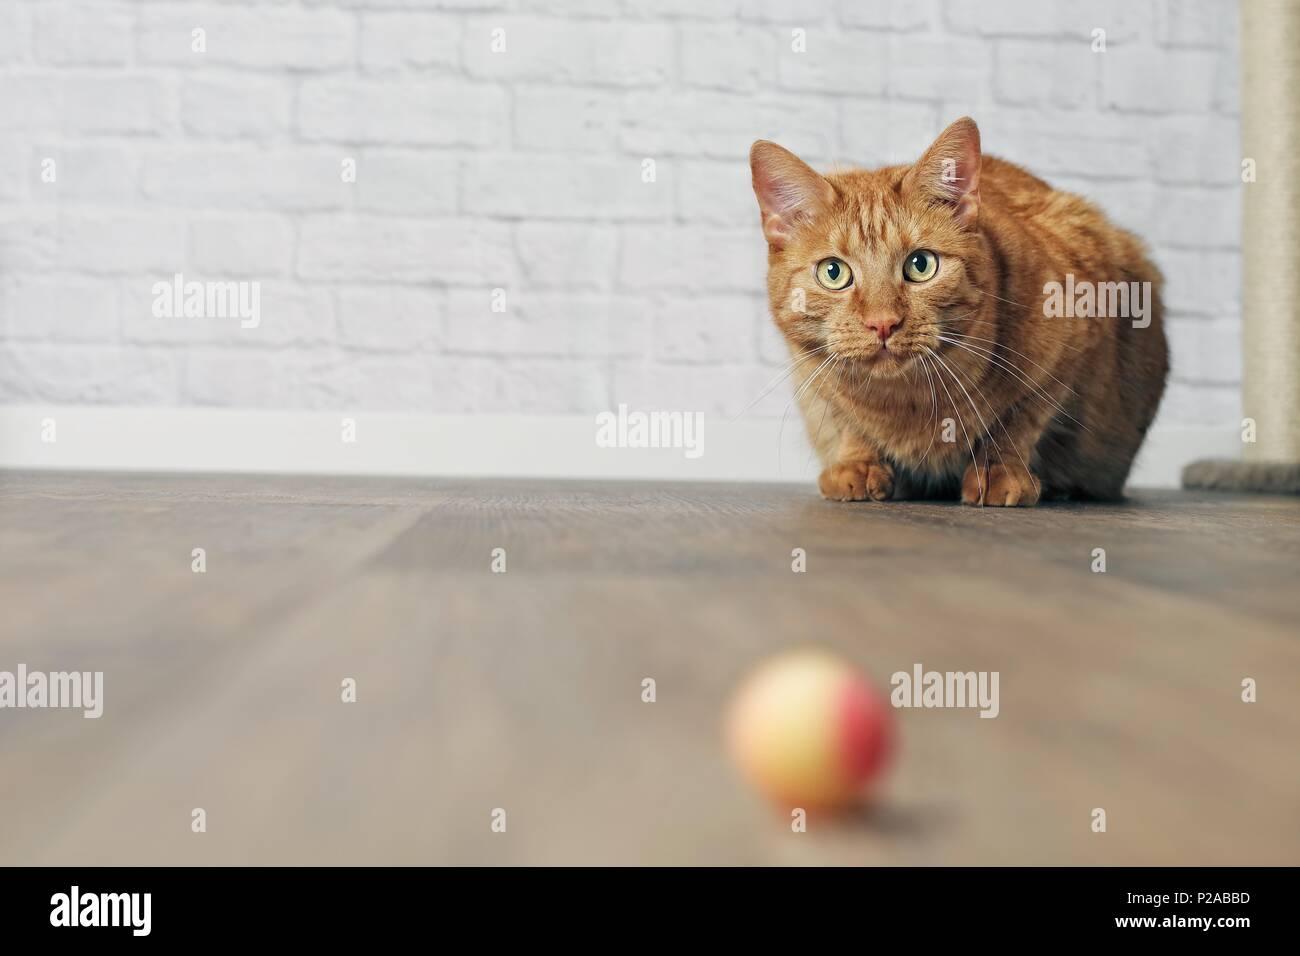 Cute ginger Cat und lauert. Stockbild